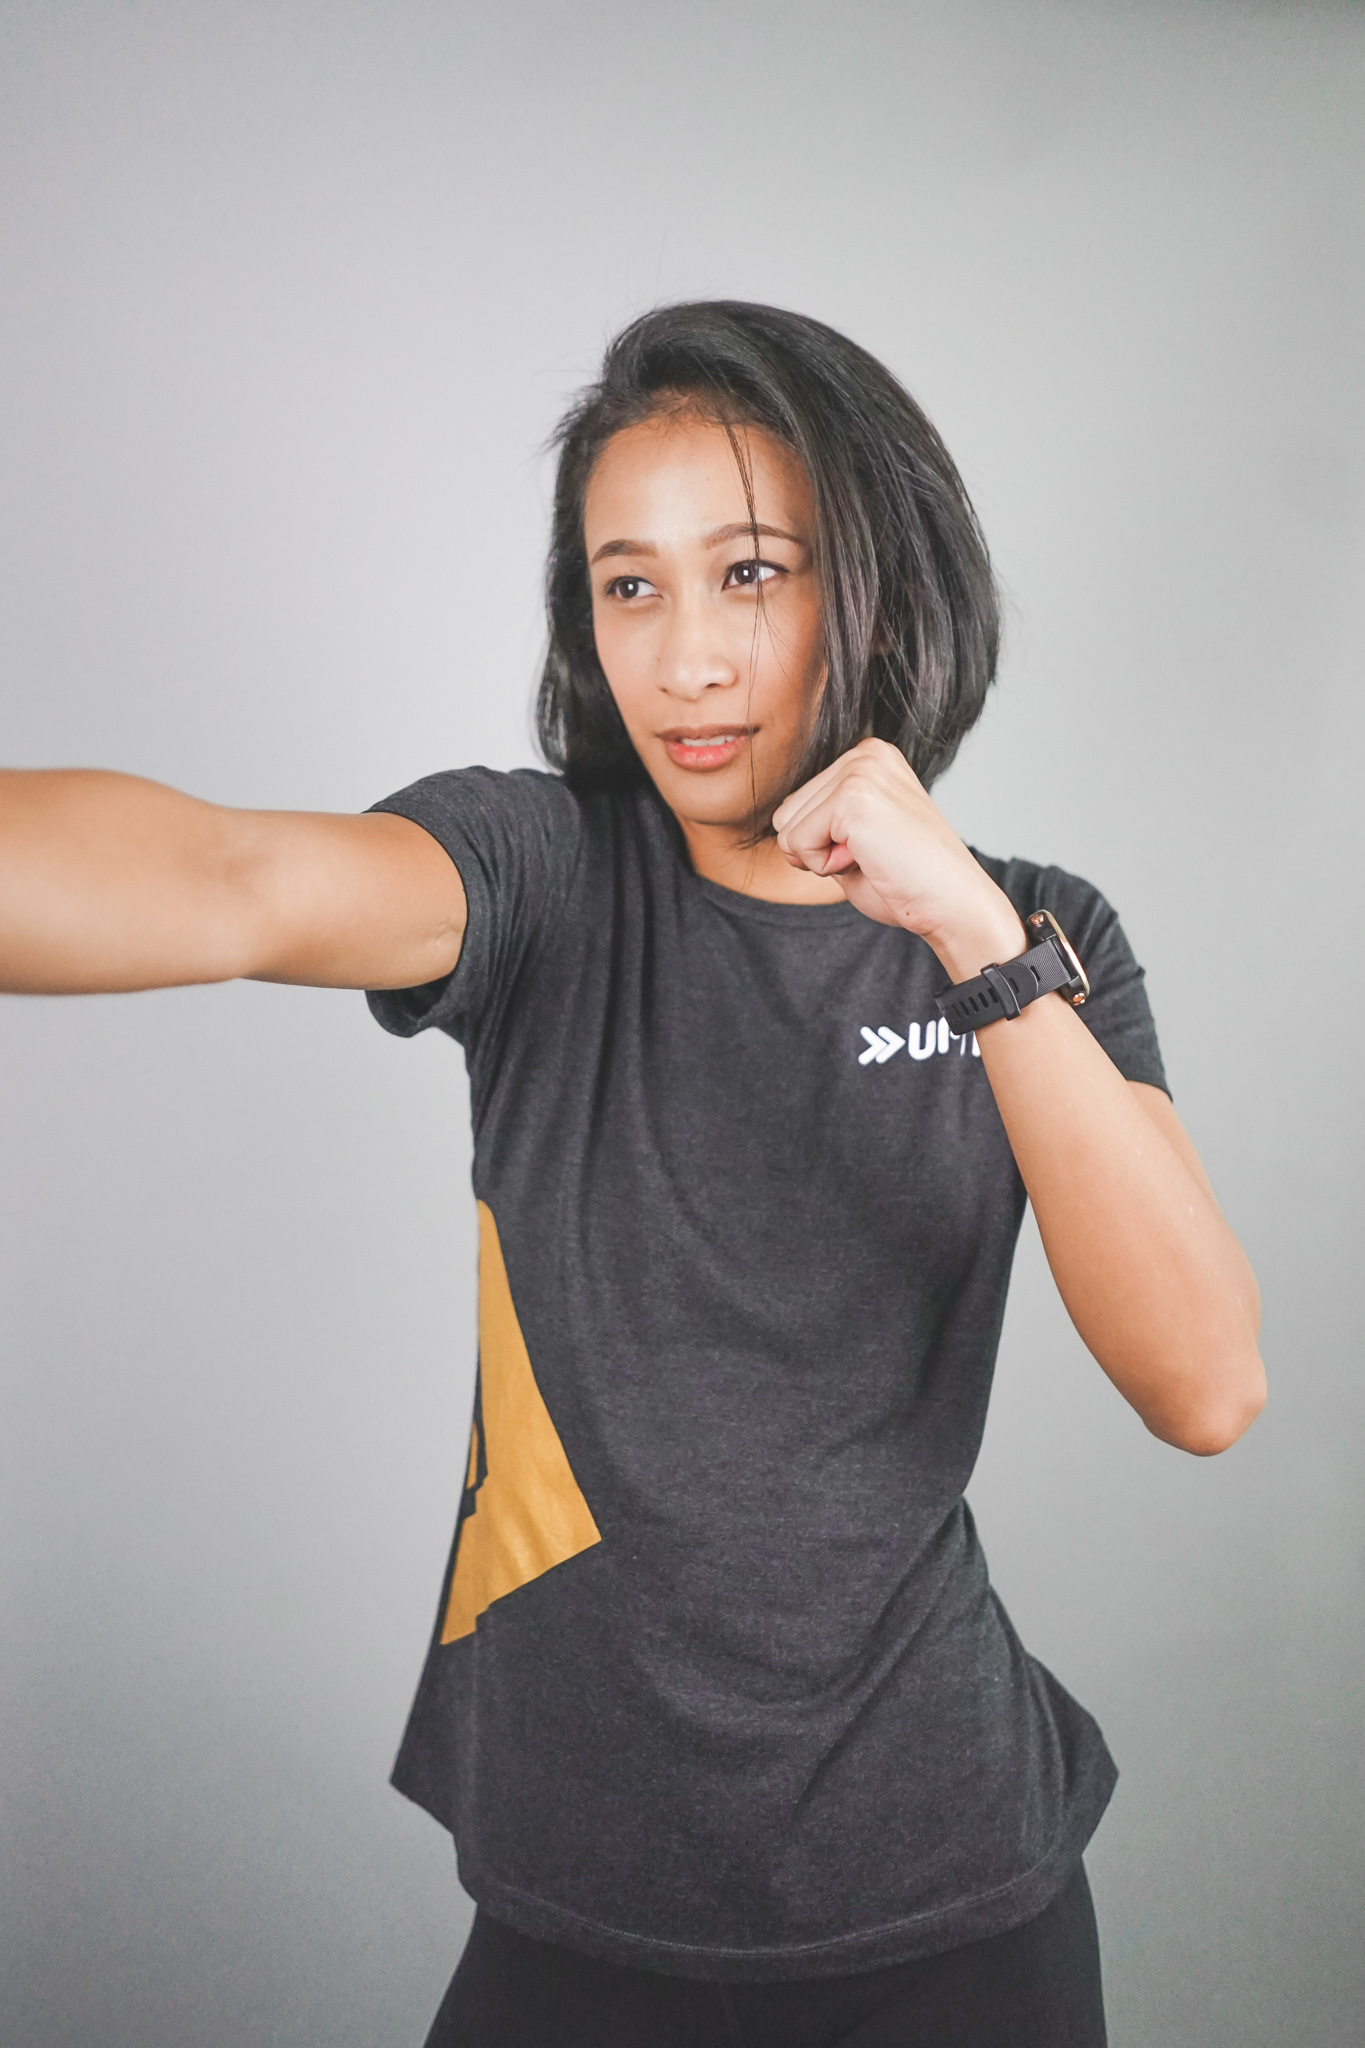 Nada Khalid UFIT Physiotherapist